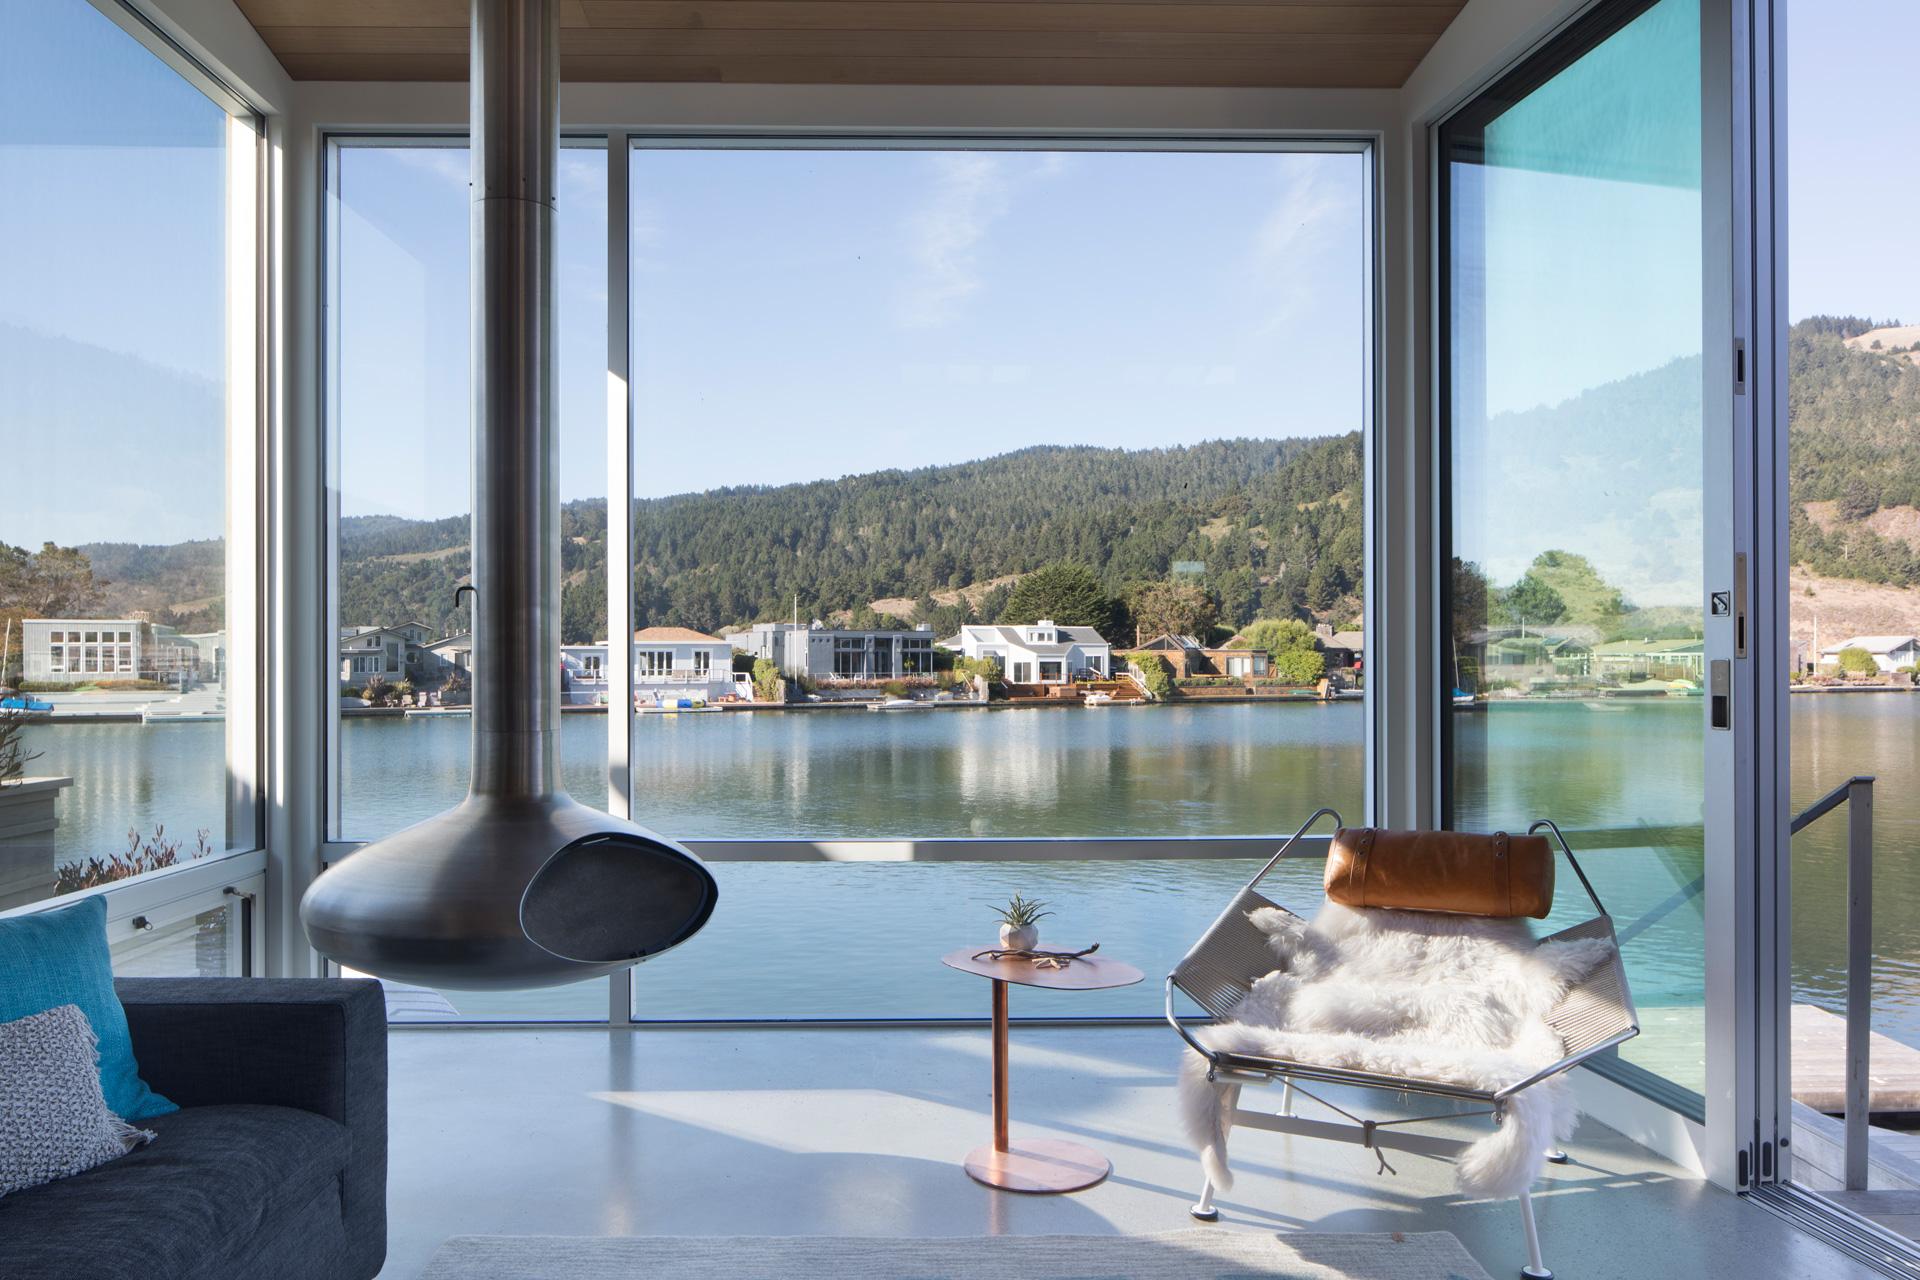 Lagoon House interiors